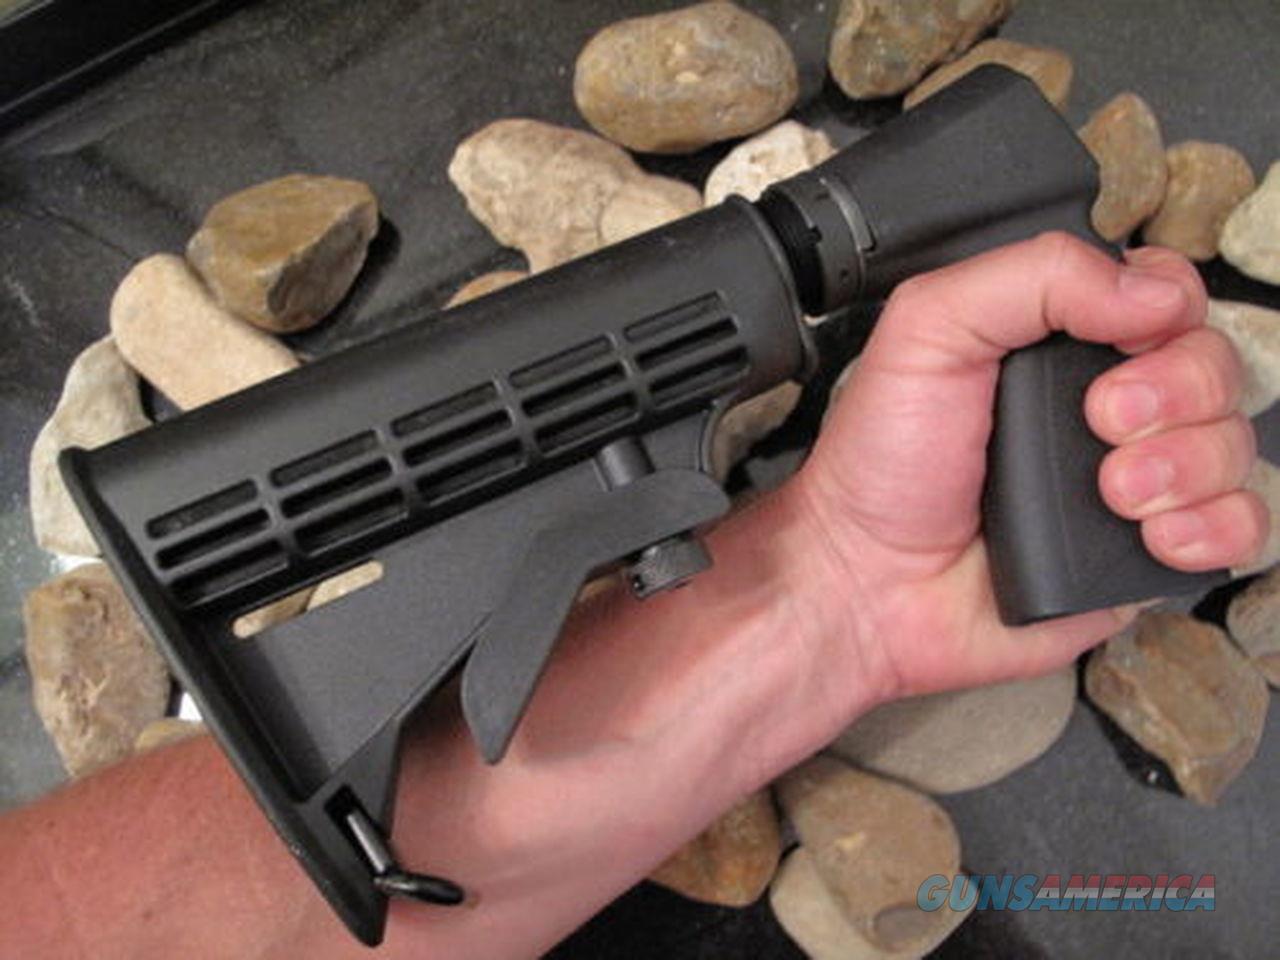 Fits Remington 870 12 Gauge 6 position Stock TRI Shotgun Tactical Pistol Grip  Non-Guns > Ammunition